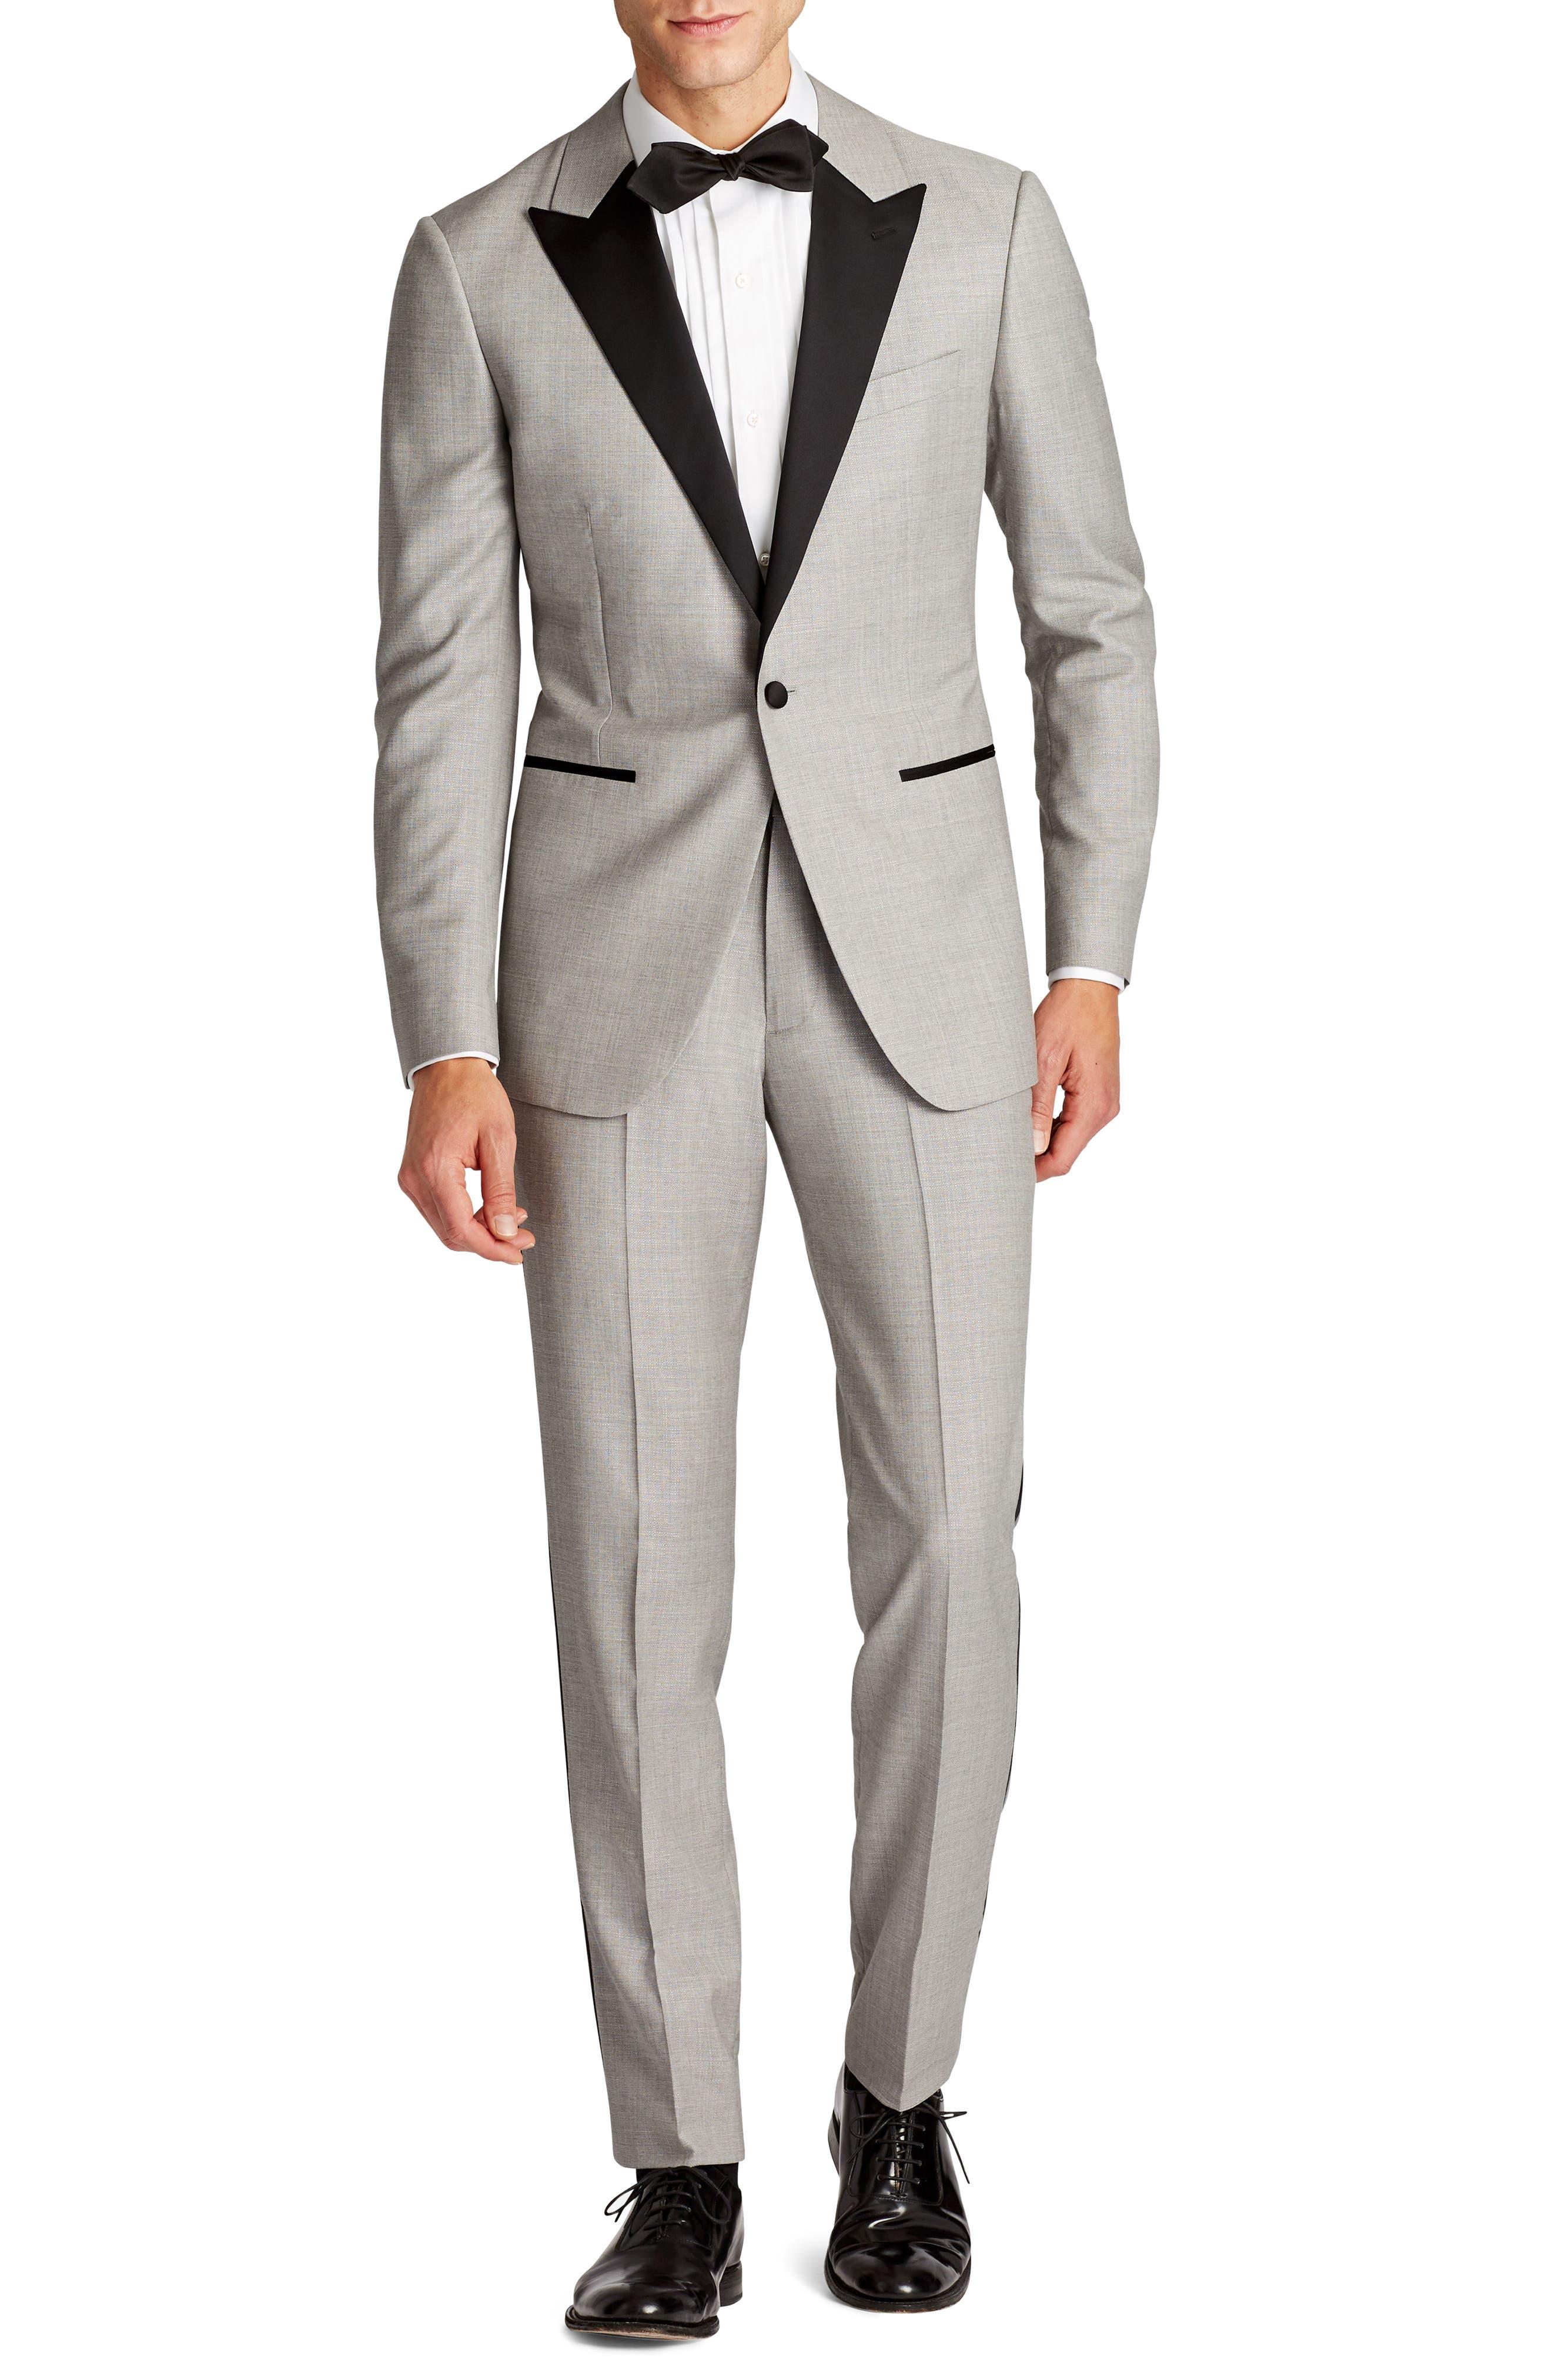 Capstone Flat Front Tuxedo Trousers,                             Alternate thumbnail 4, color,                             020